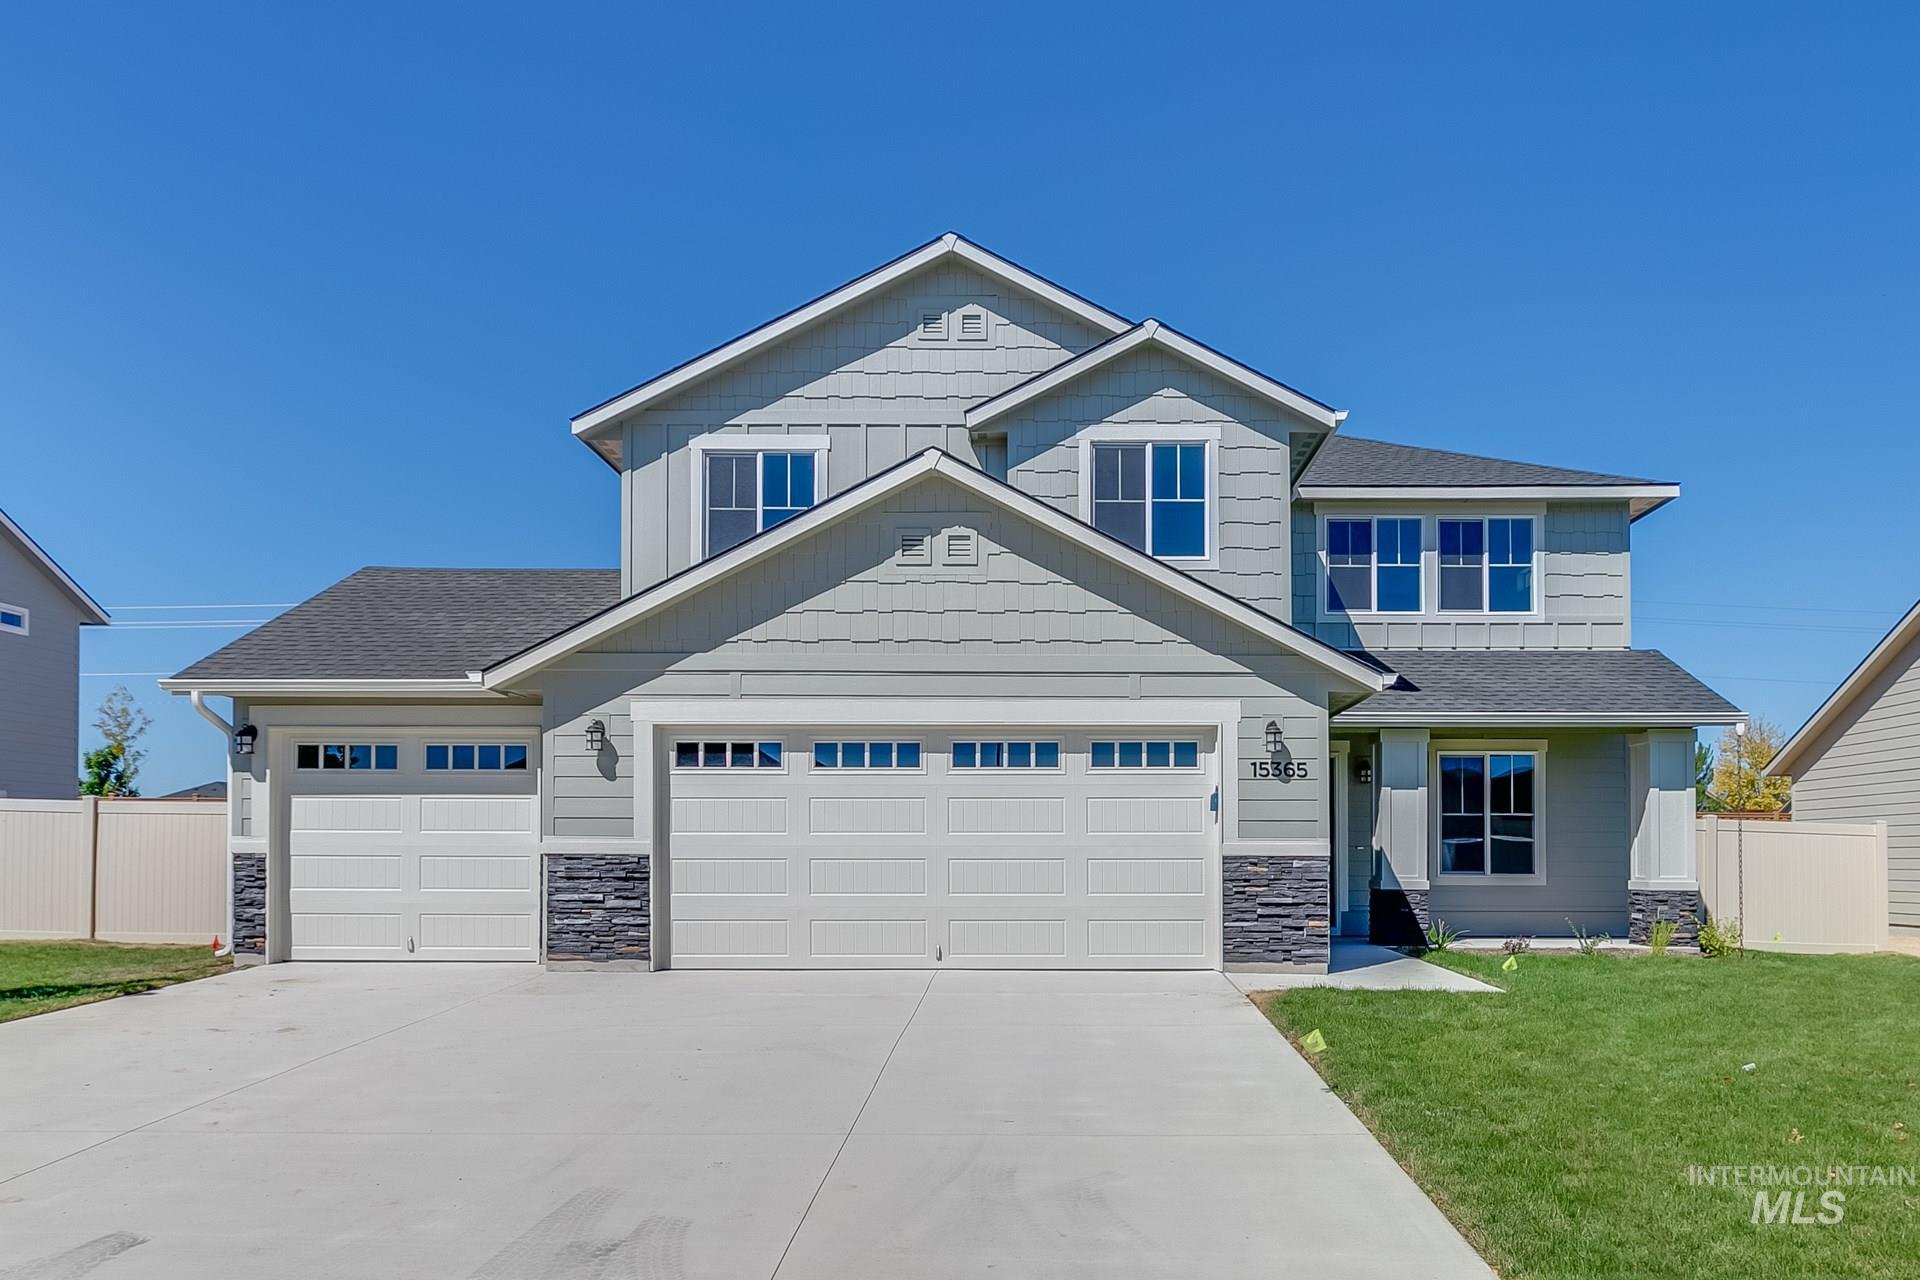 11201 W Roanoke River St Property Photo